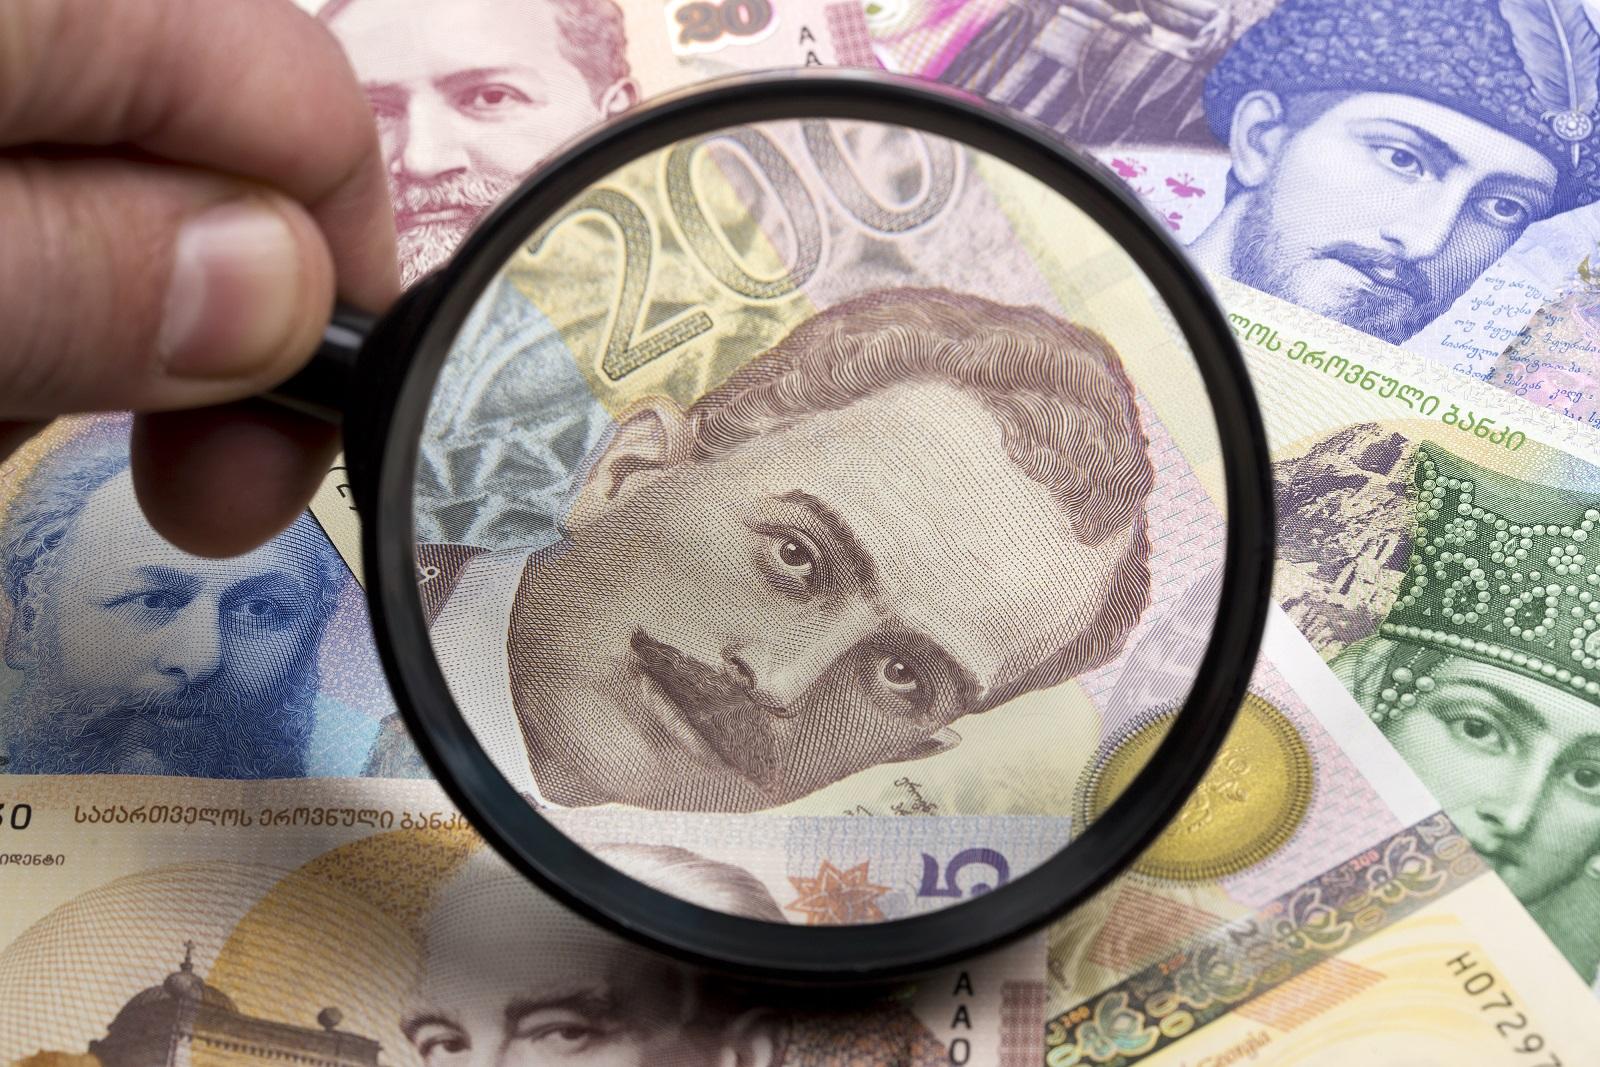 georgian lari in a magnifying glass 58N887W #общество featured, кредит, Микрокредит, финансы